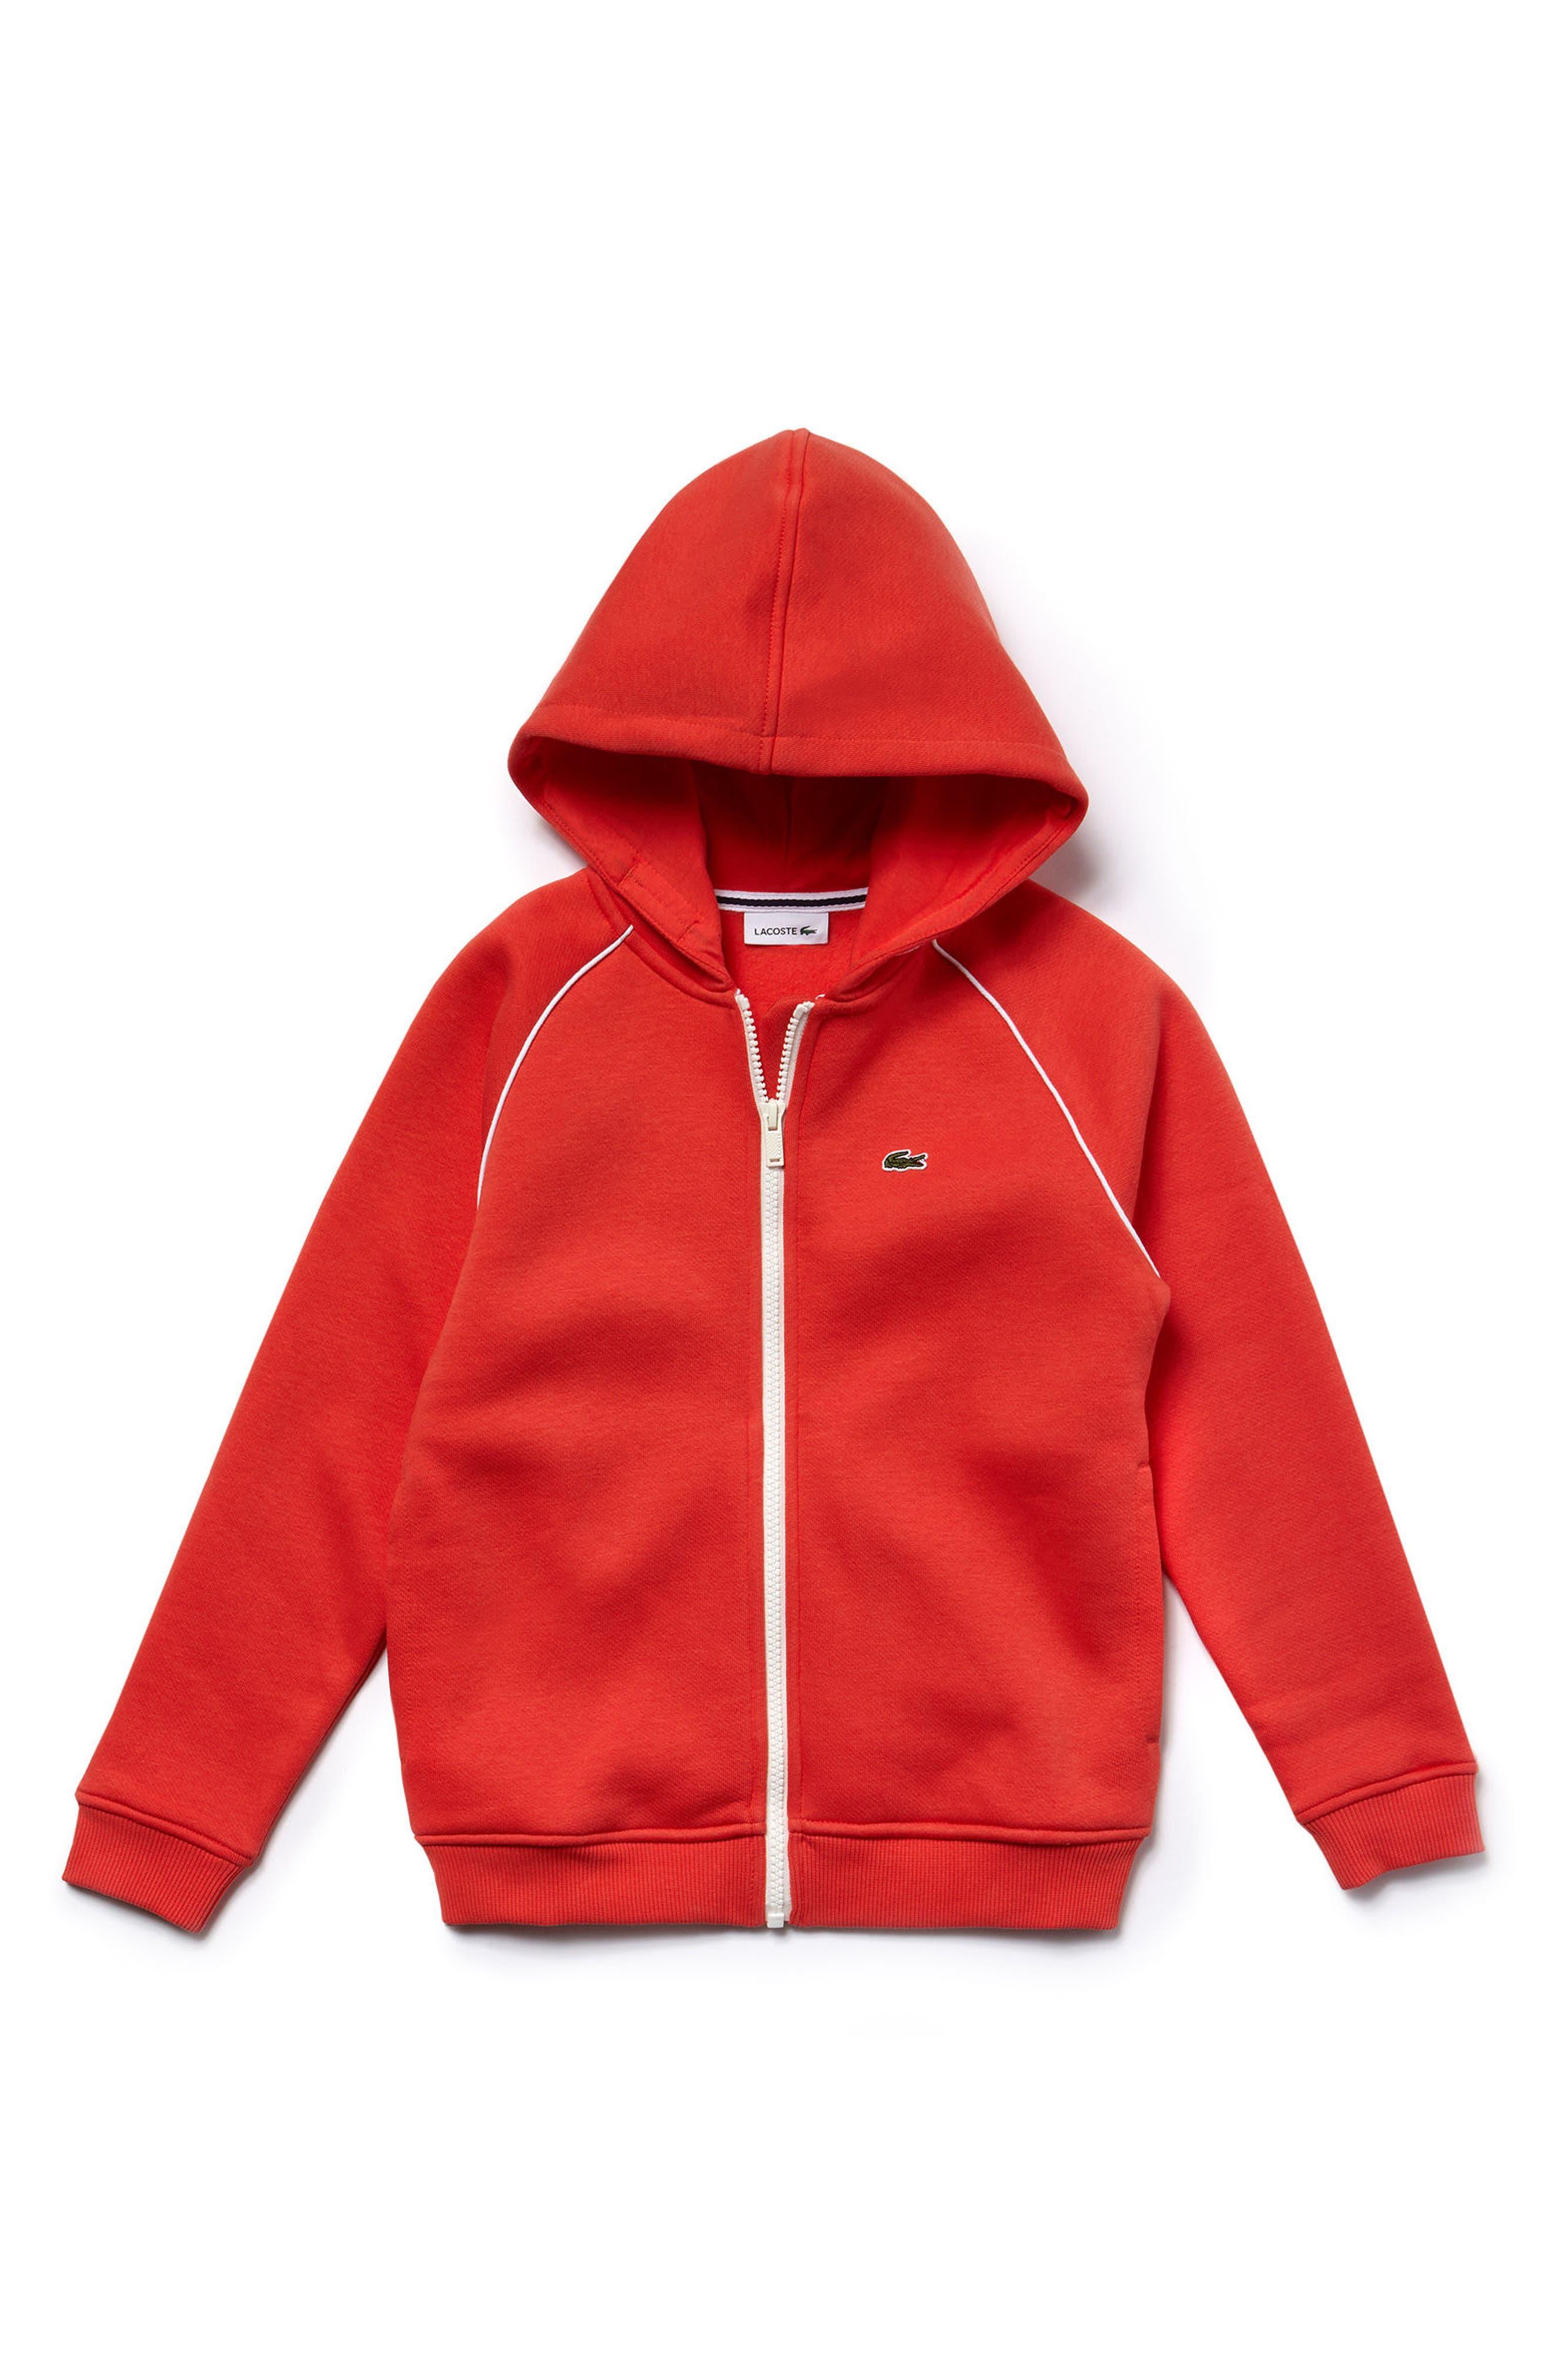 Lacoste Full Zip Hoodie (Toddler Boys & Little Boys)